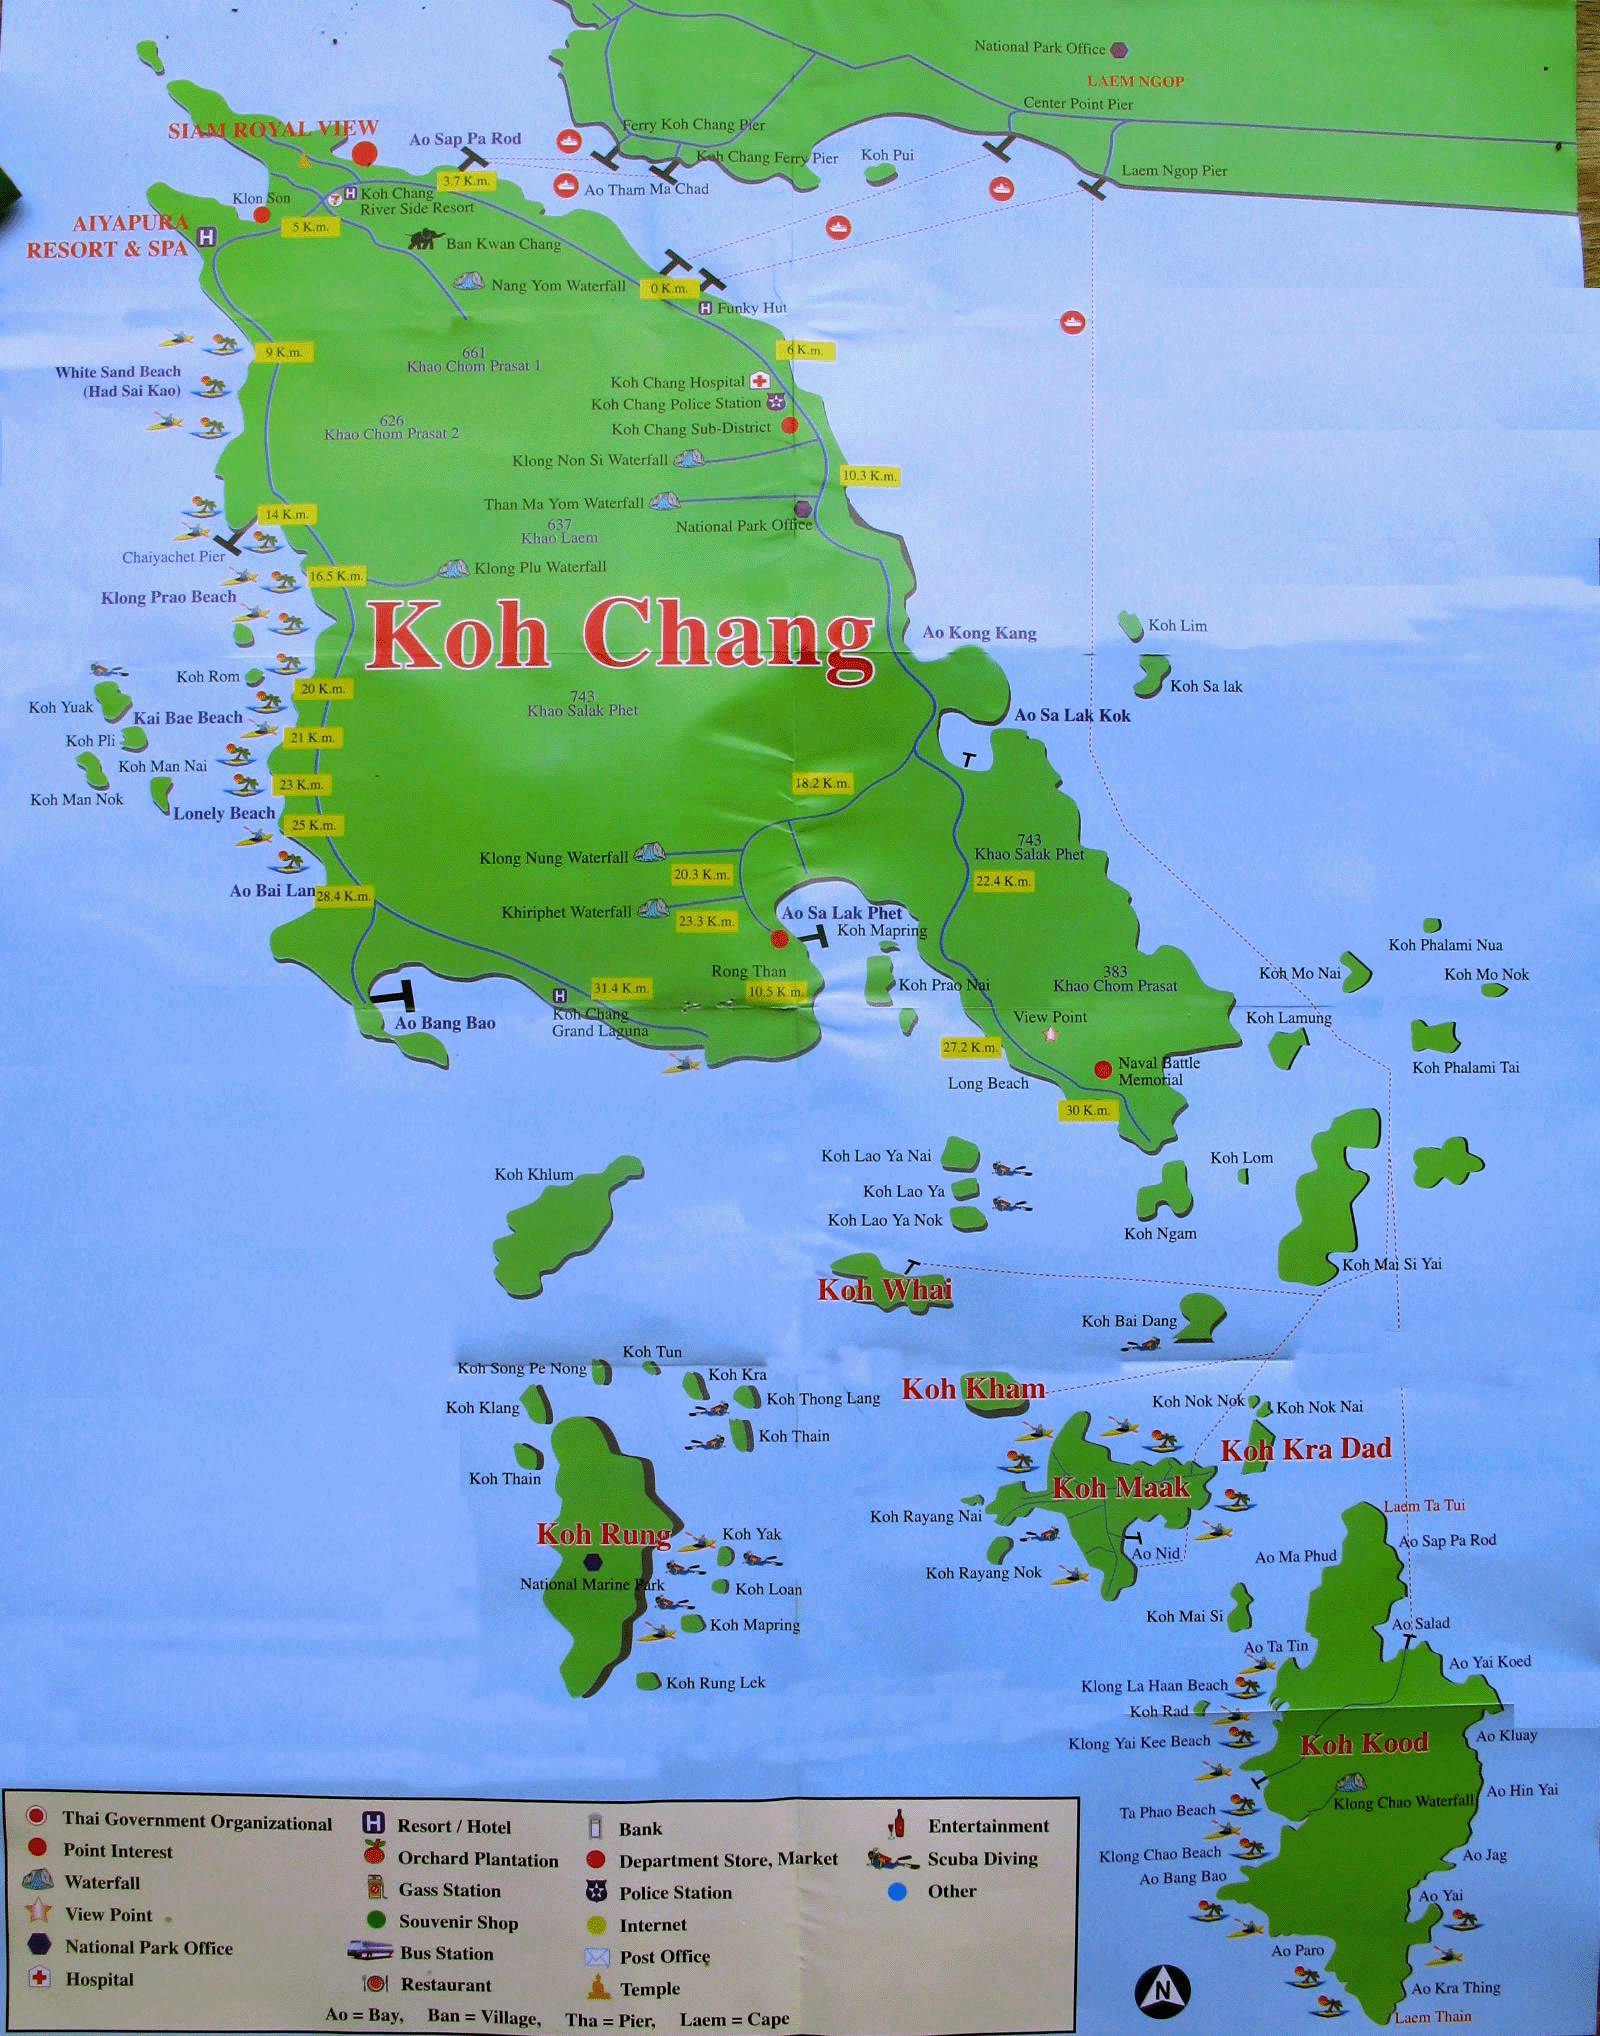 карта ко чанга с островами